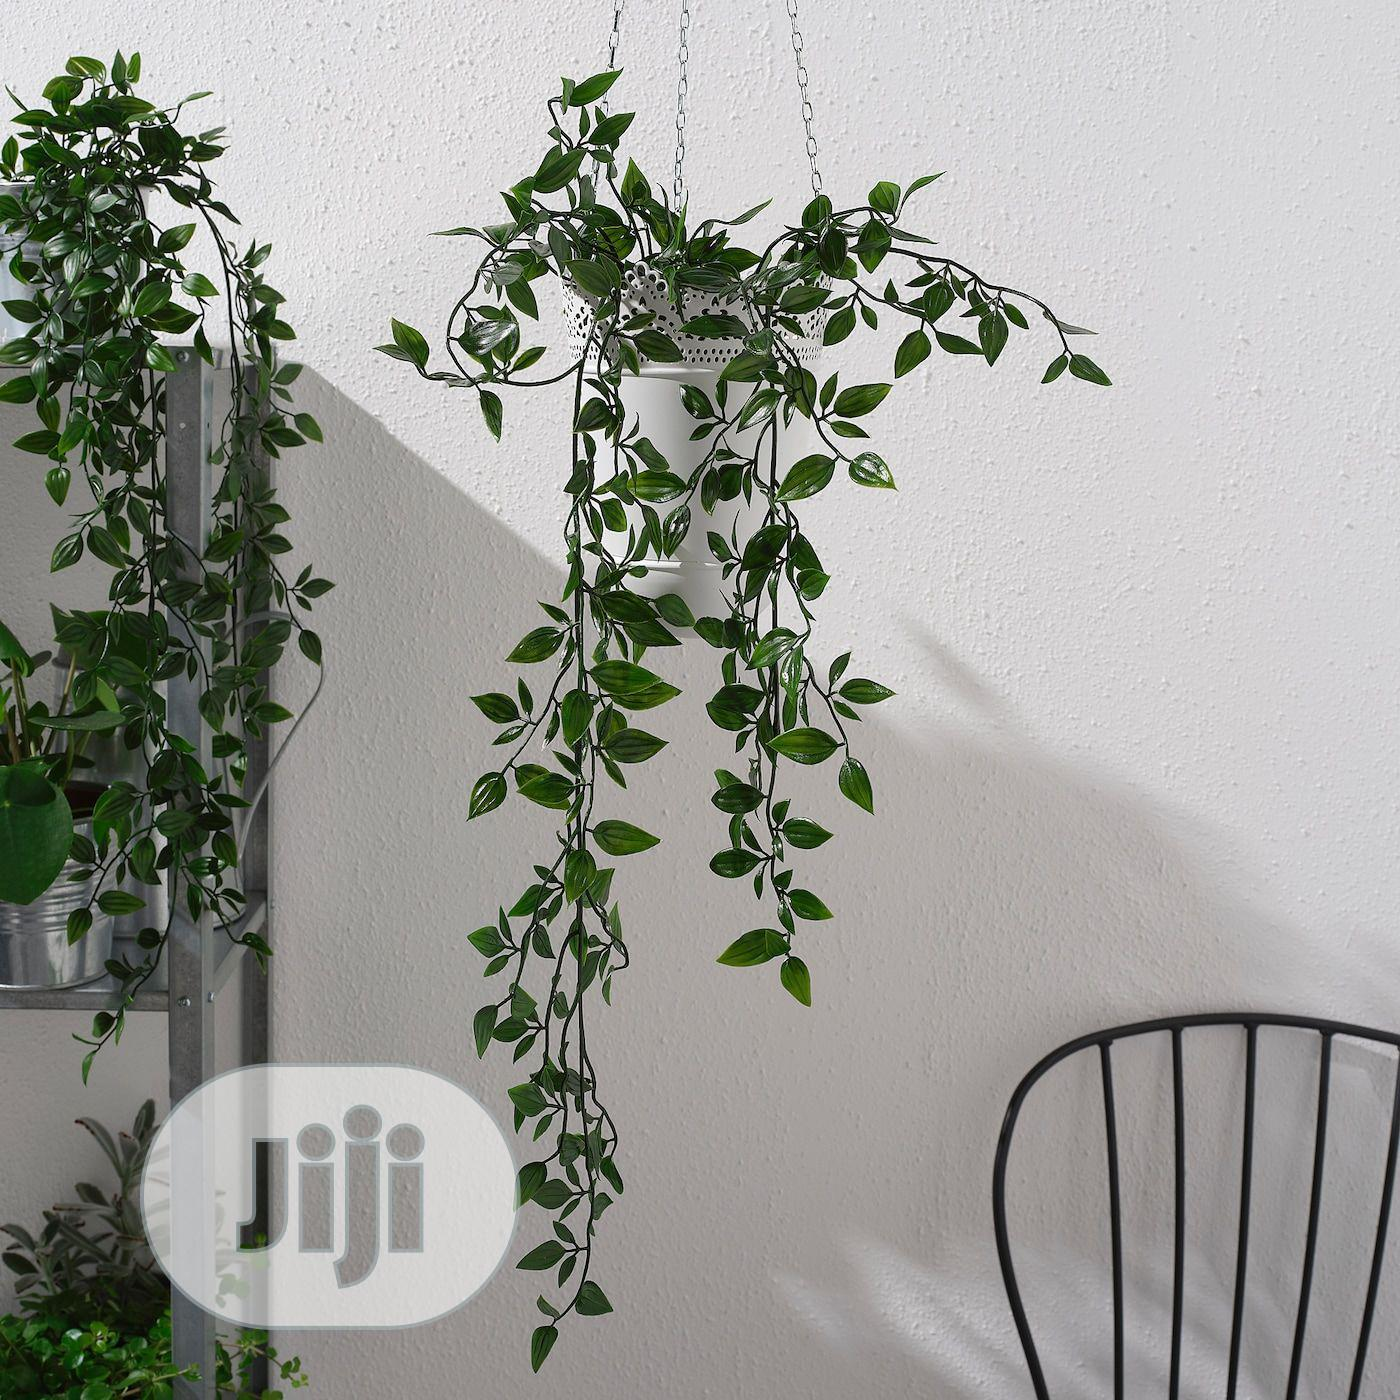 Outdoor Artificial Wall Plants (Outdoor Design)